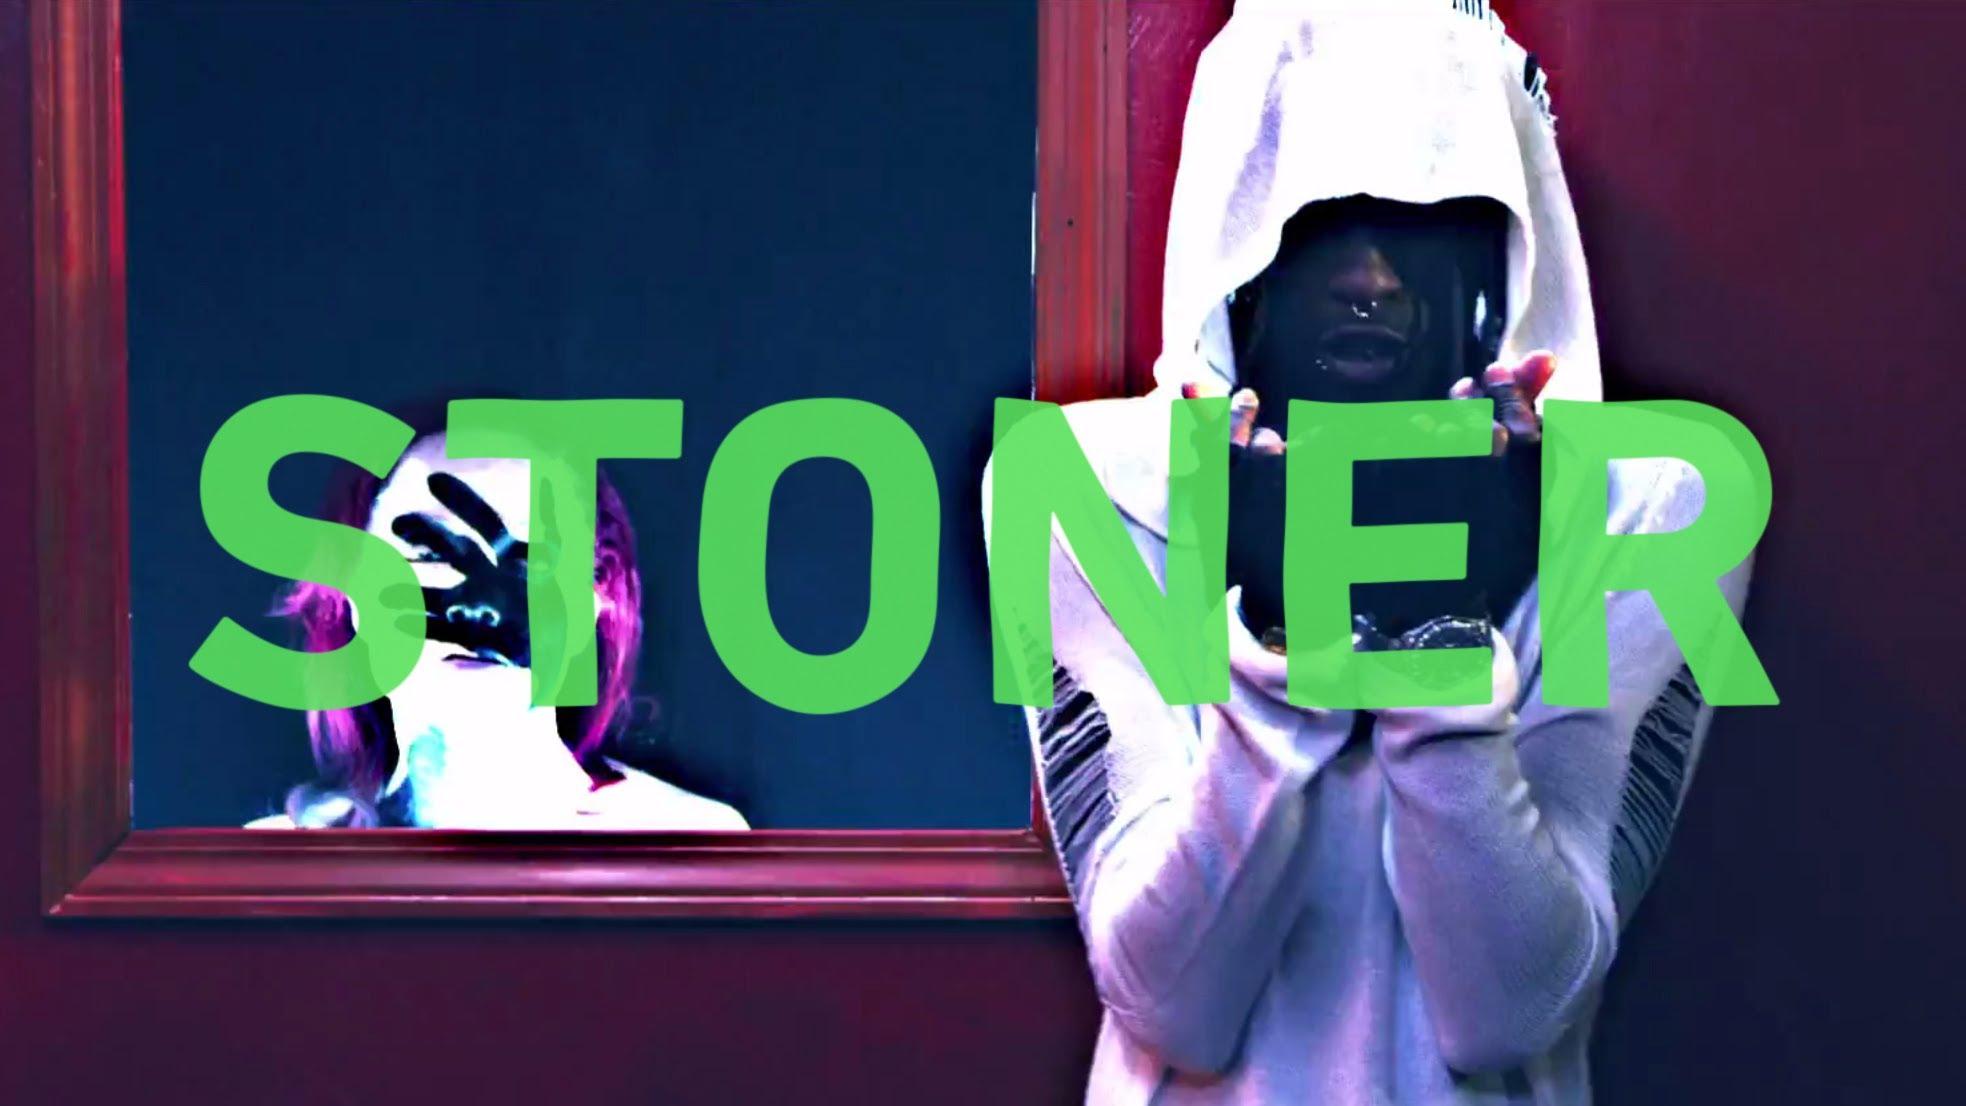 Young Thug Stoner Rap Wallpapers 1966x1106